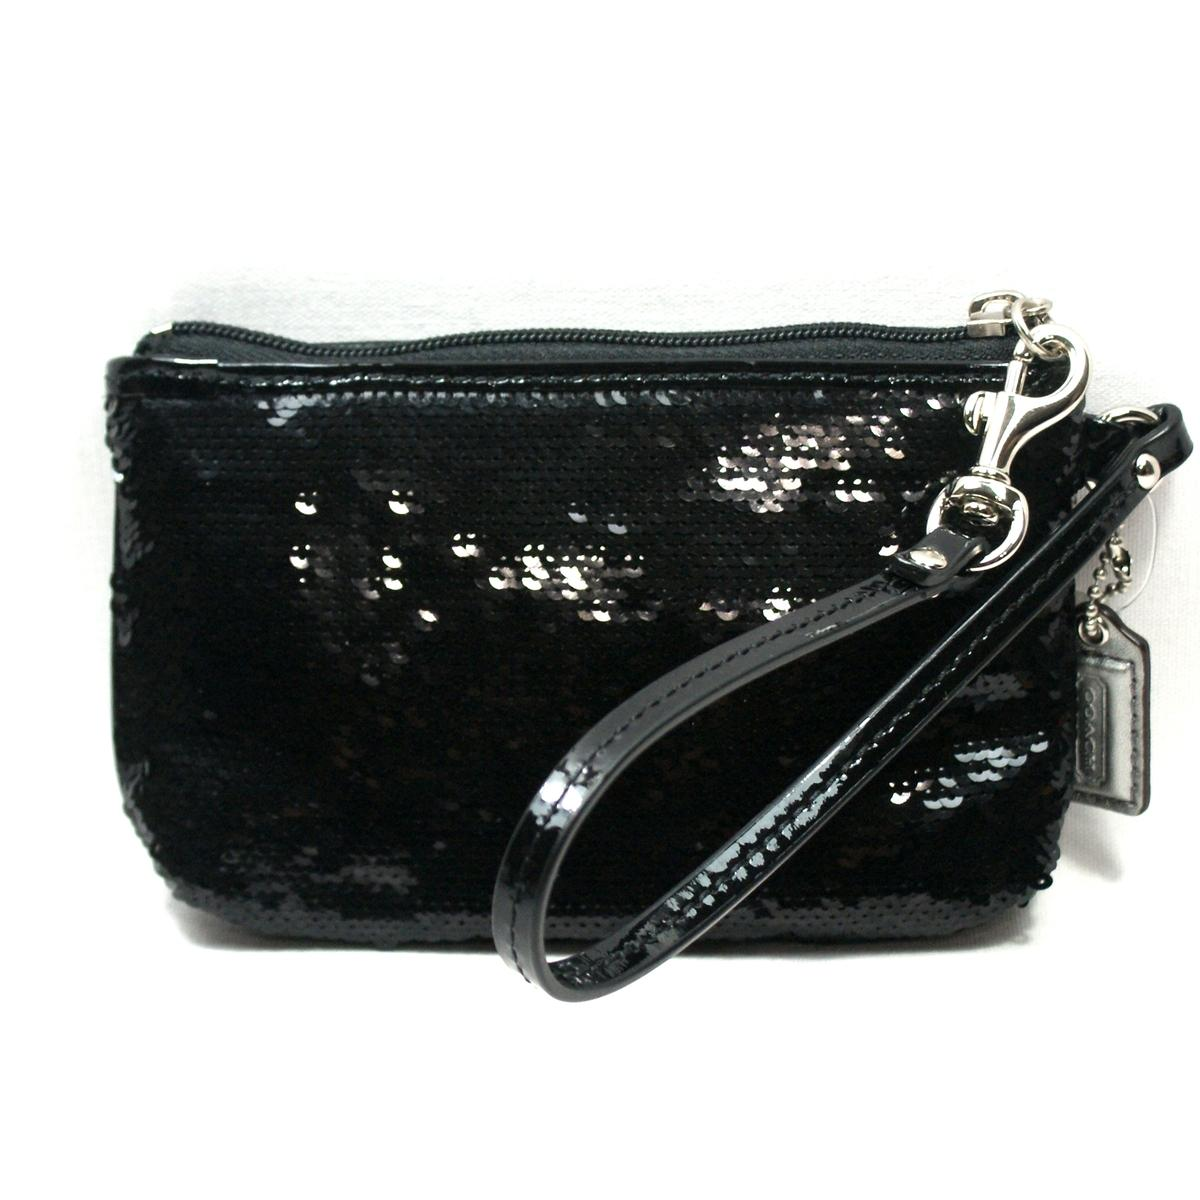 Coach Poppy Sequin Small Wristlet Black #48429   Coach 48429